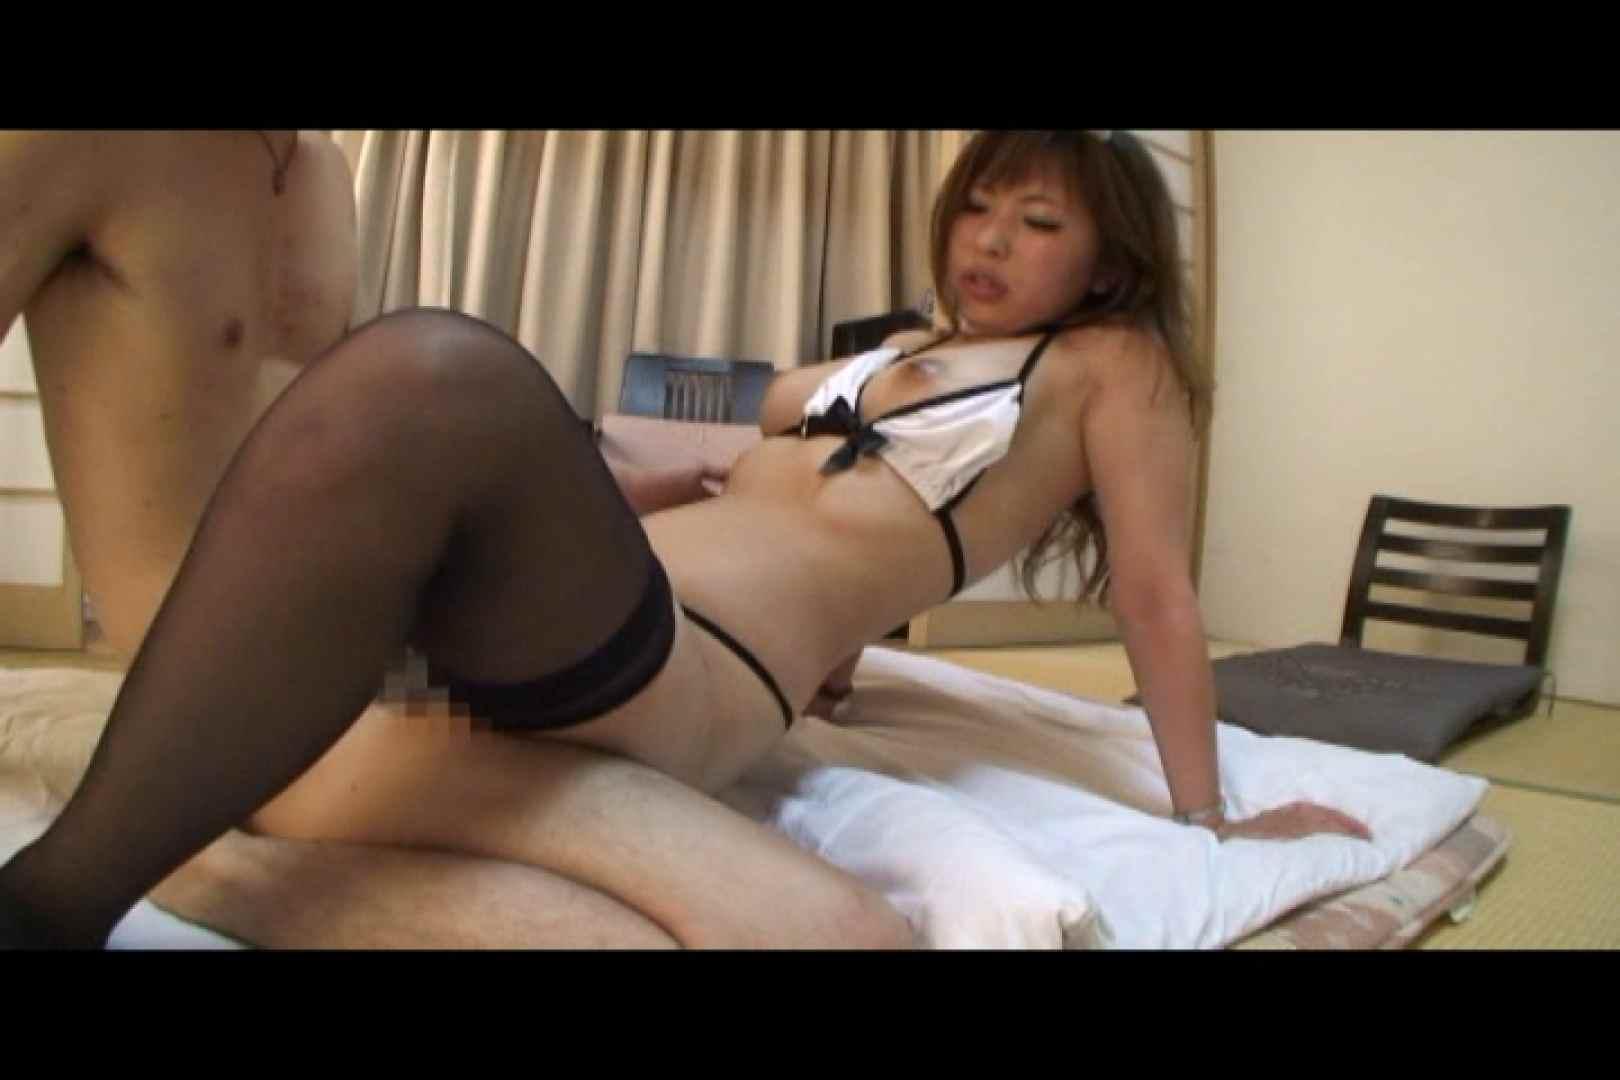 JDハンター全国ツアー vol.050 後編 女子大生のエロ生活   OLのエロ生活  93連発 21